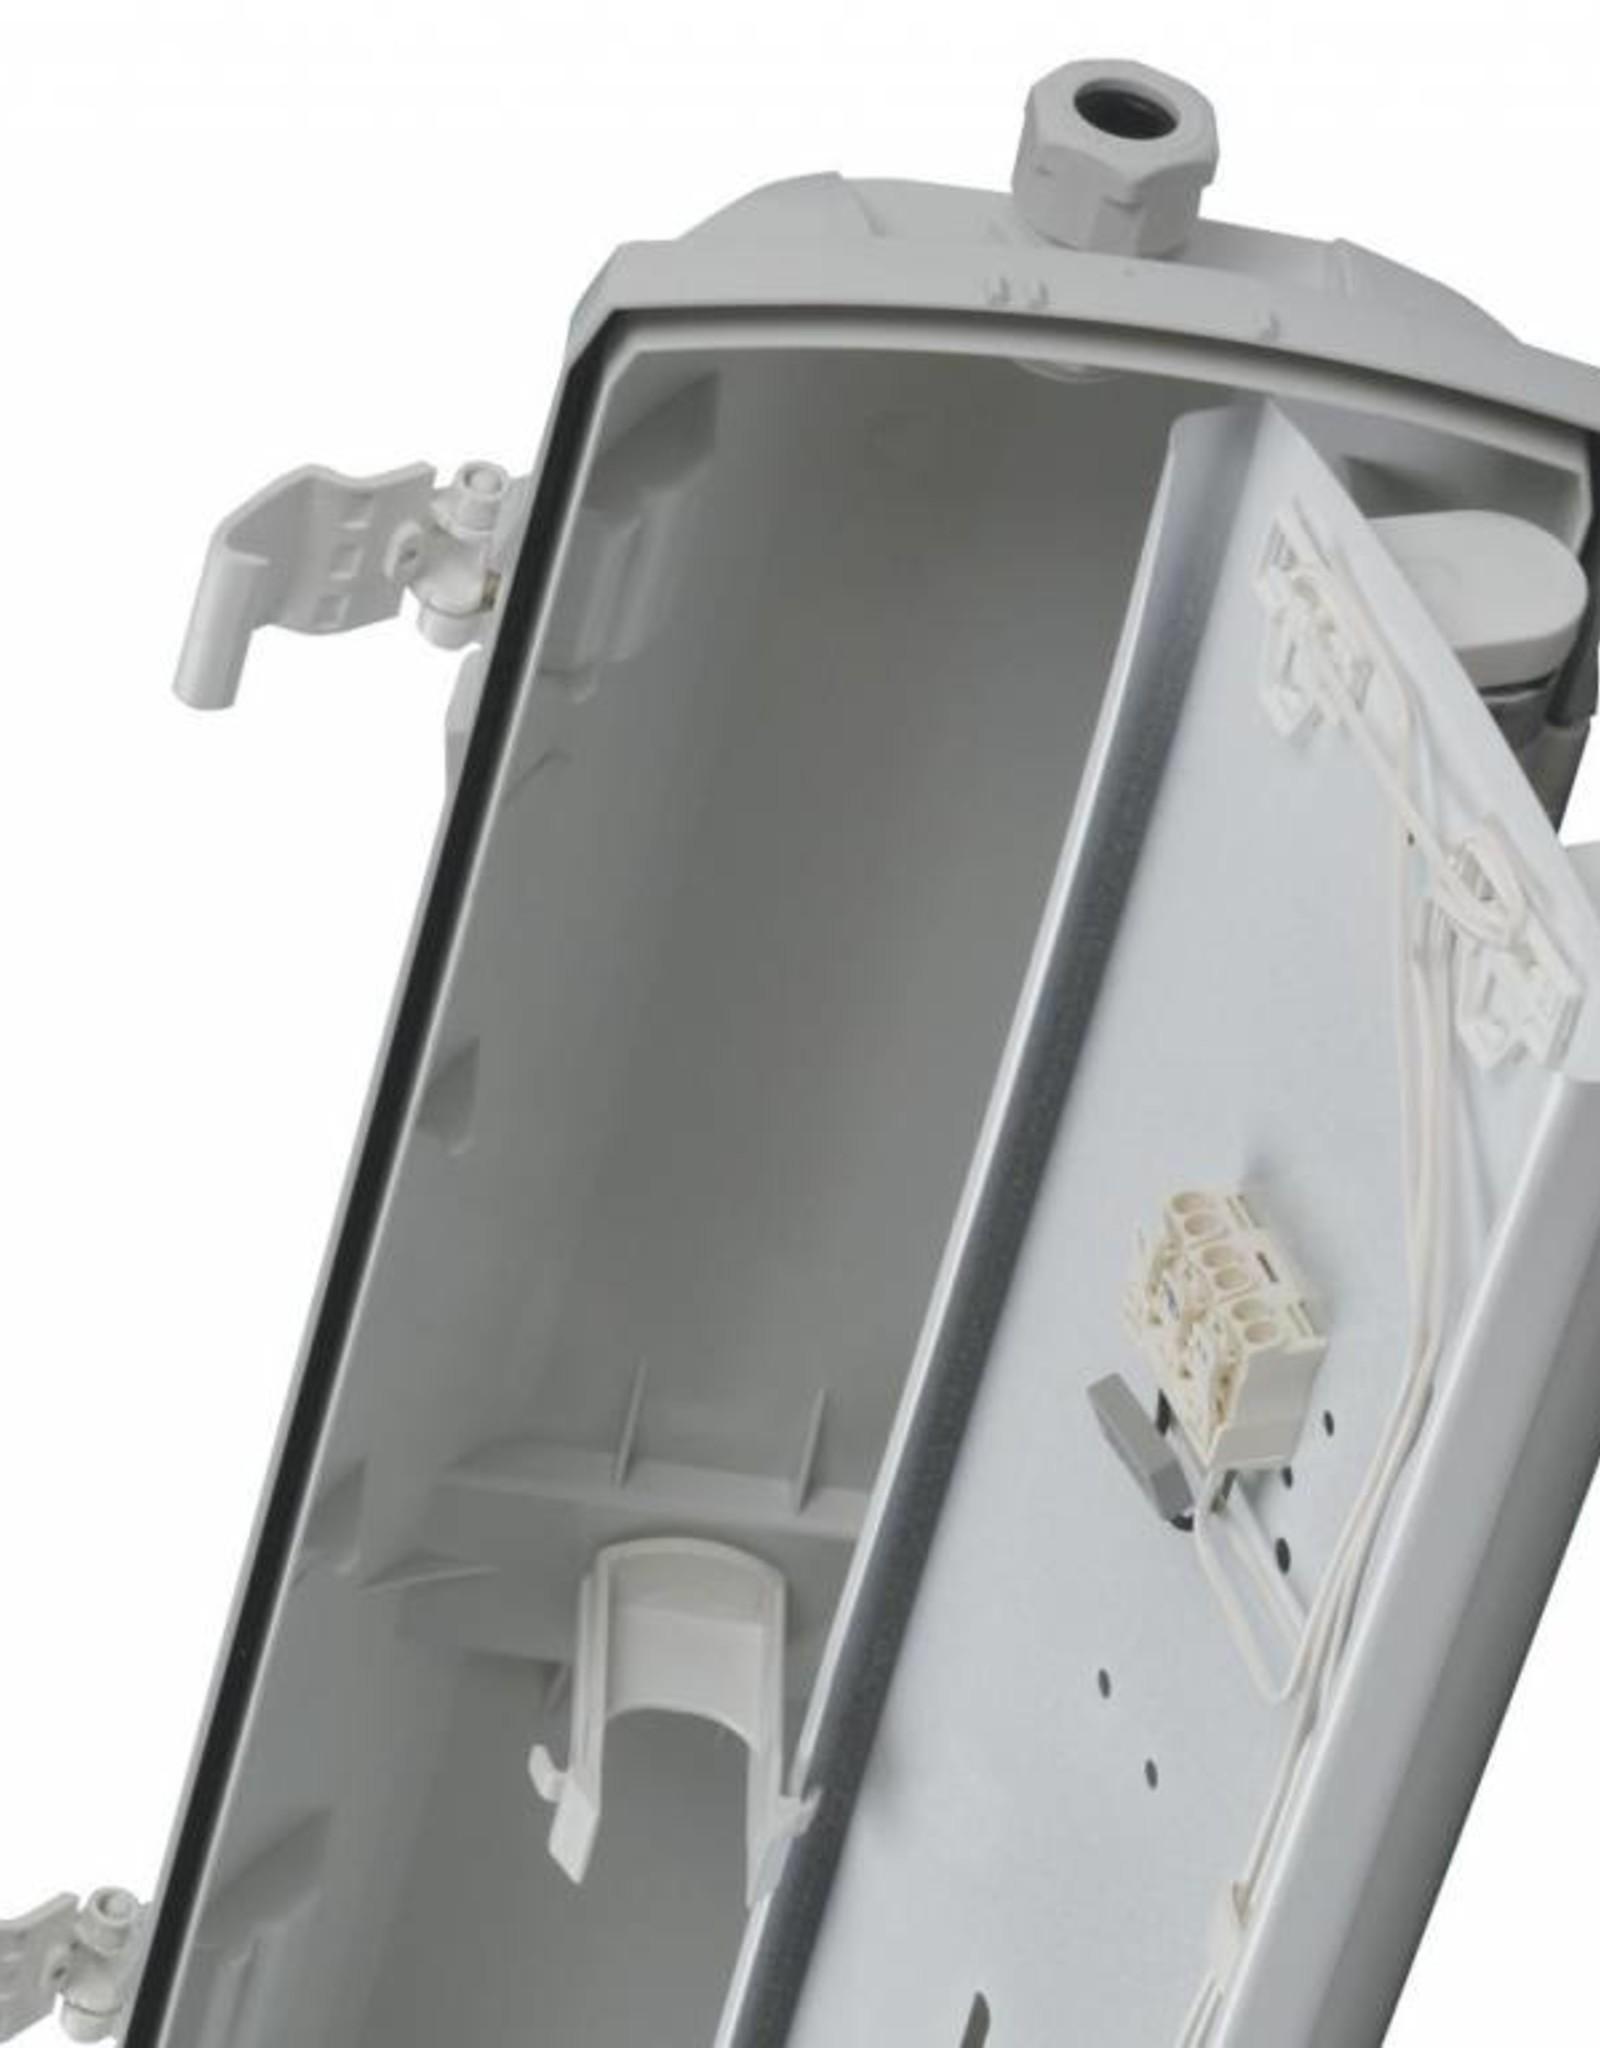 Prima 2x35W HE - ABS - inox clips - HF ballast